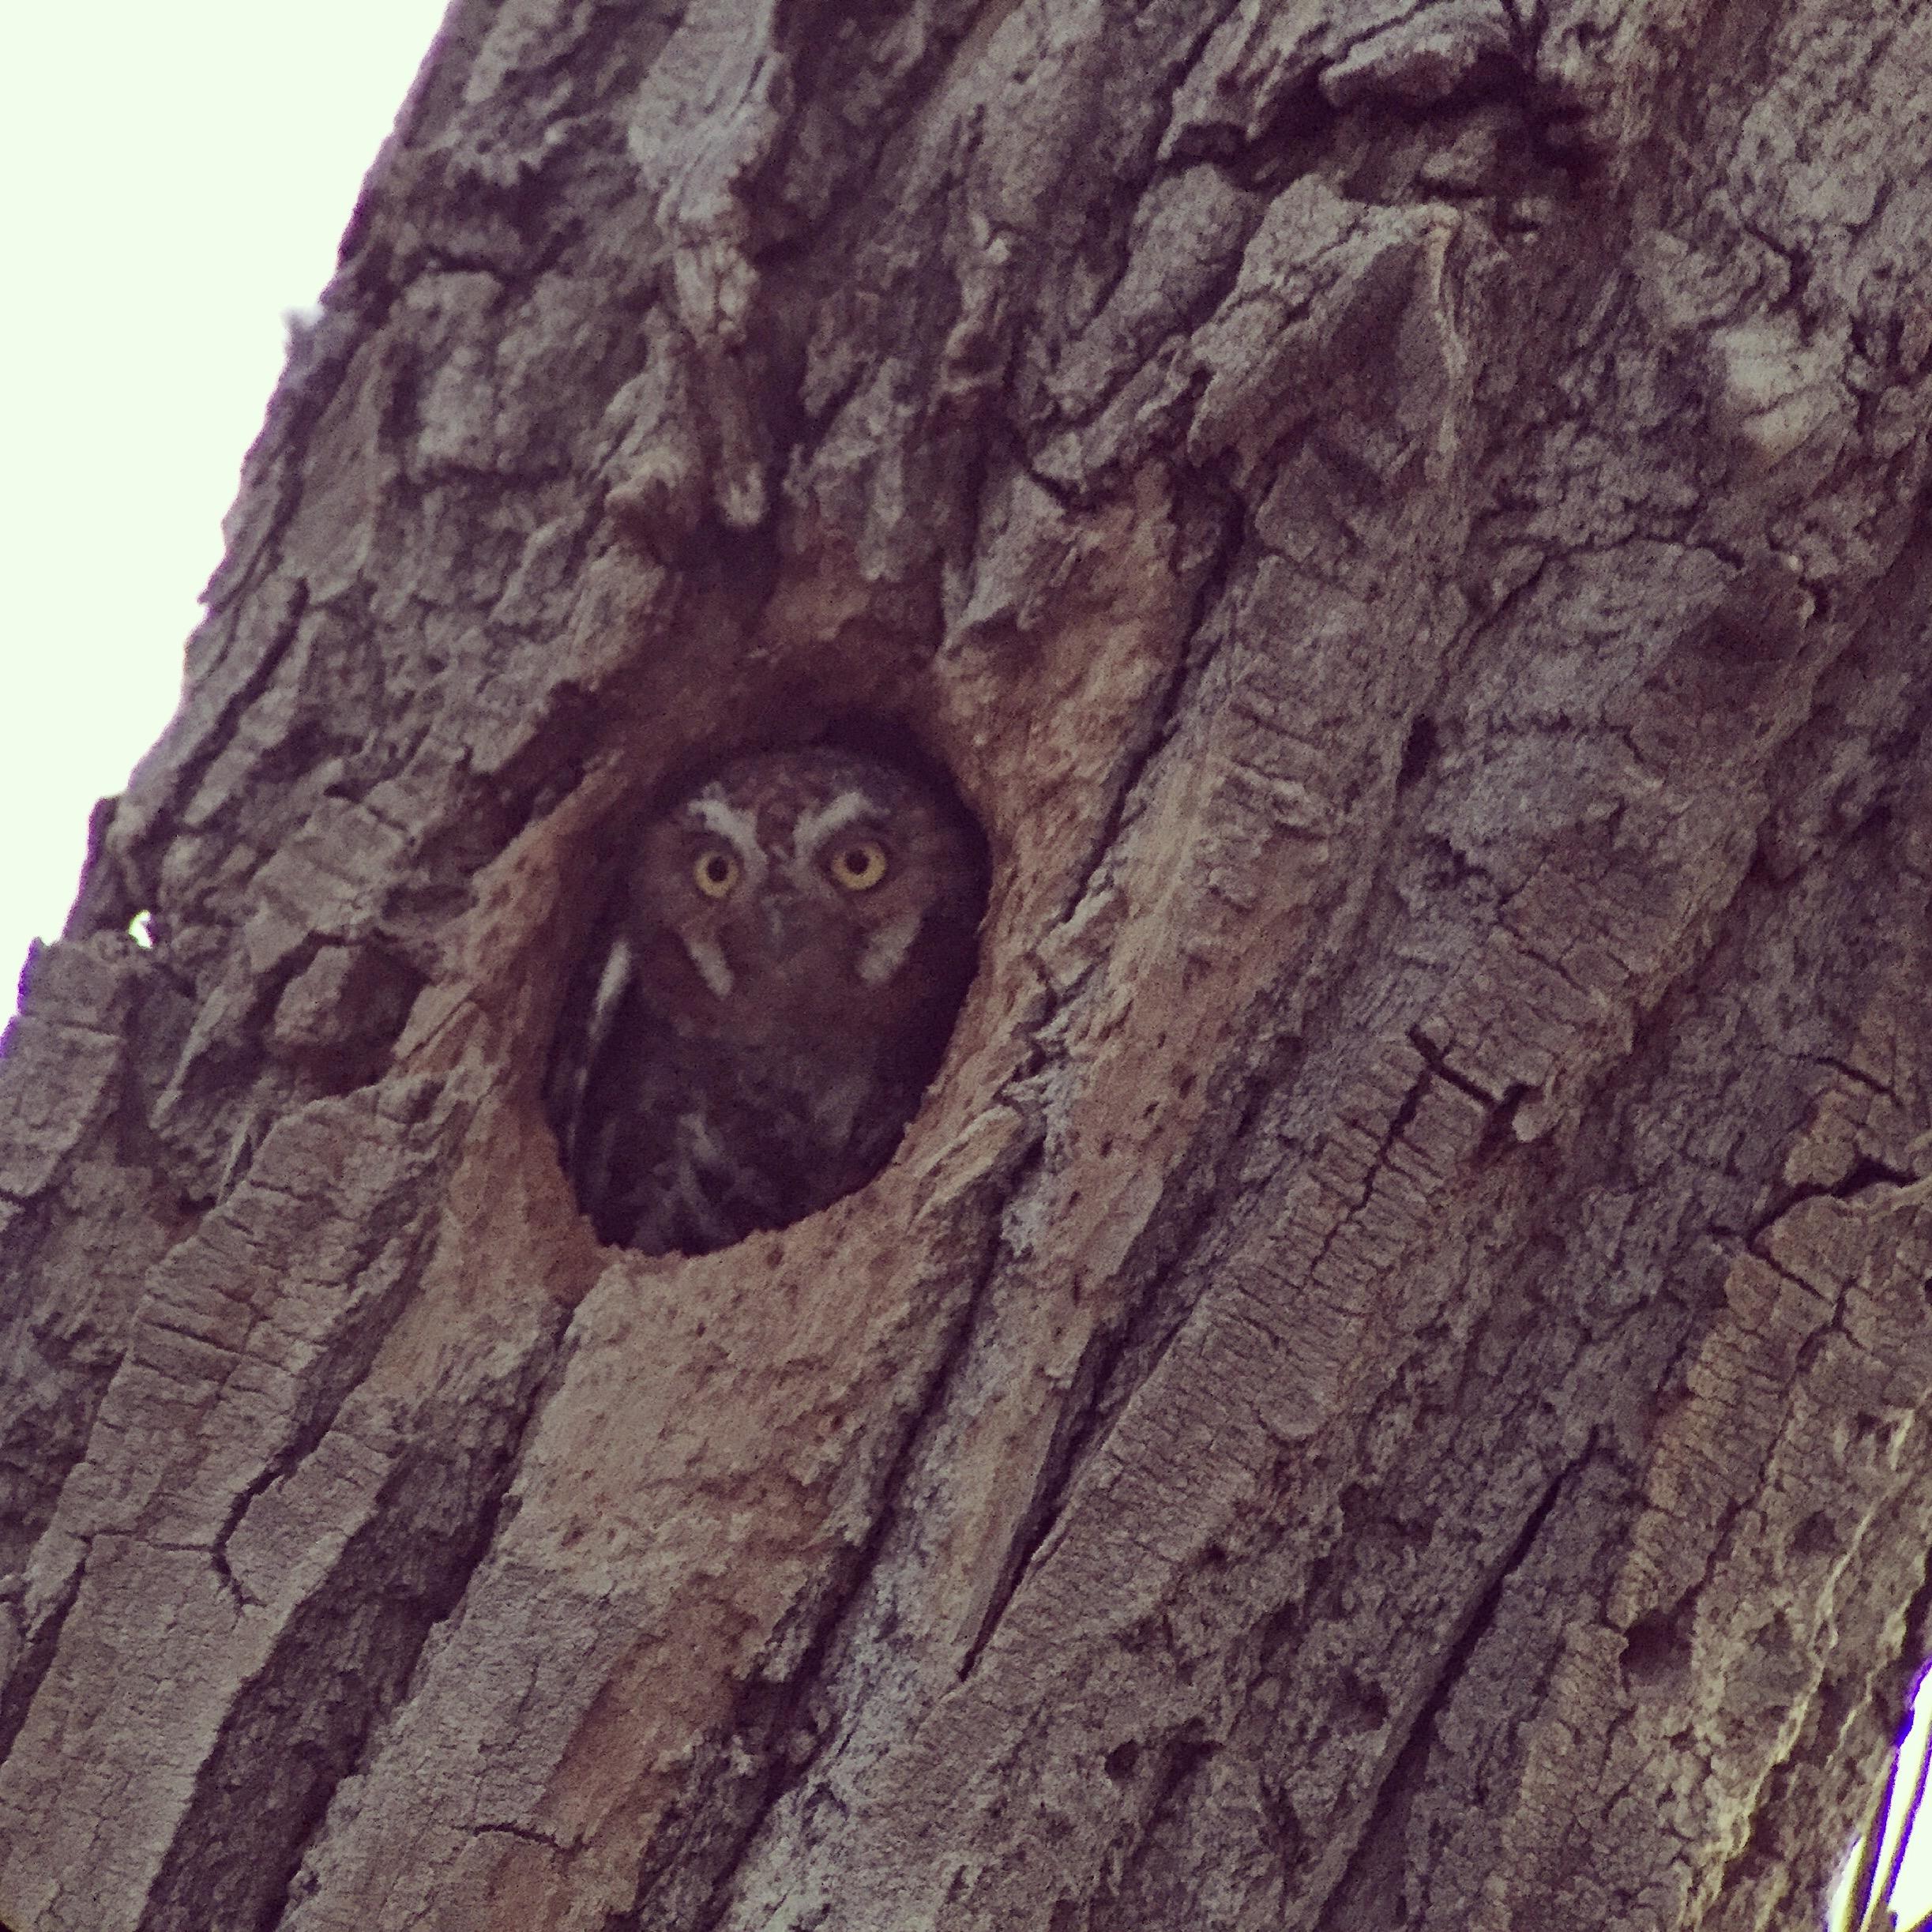 Elf Owl emerging from nest cavity